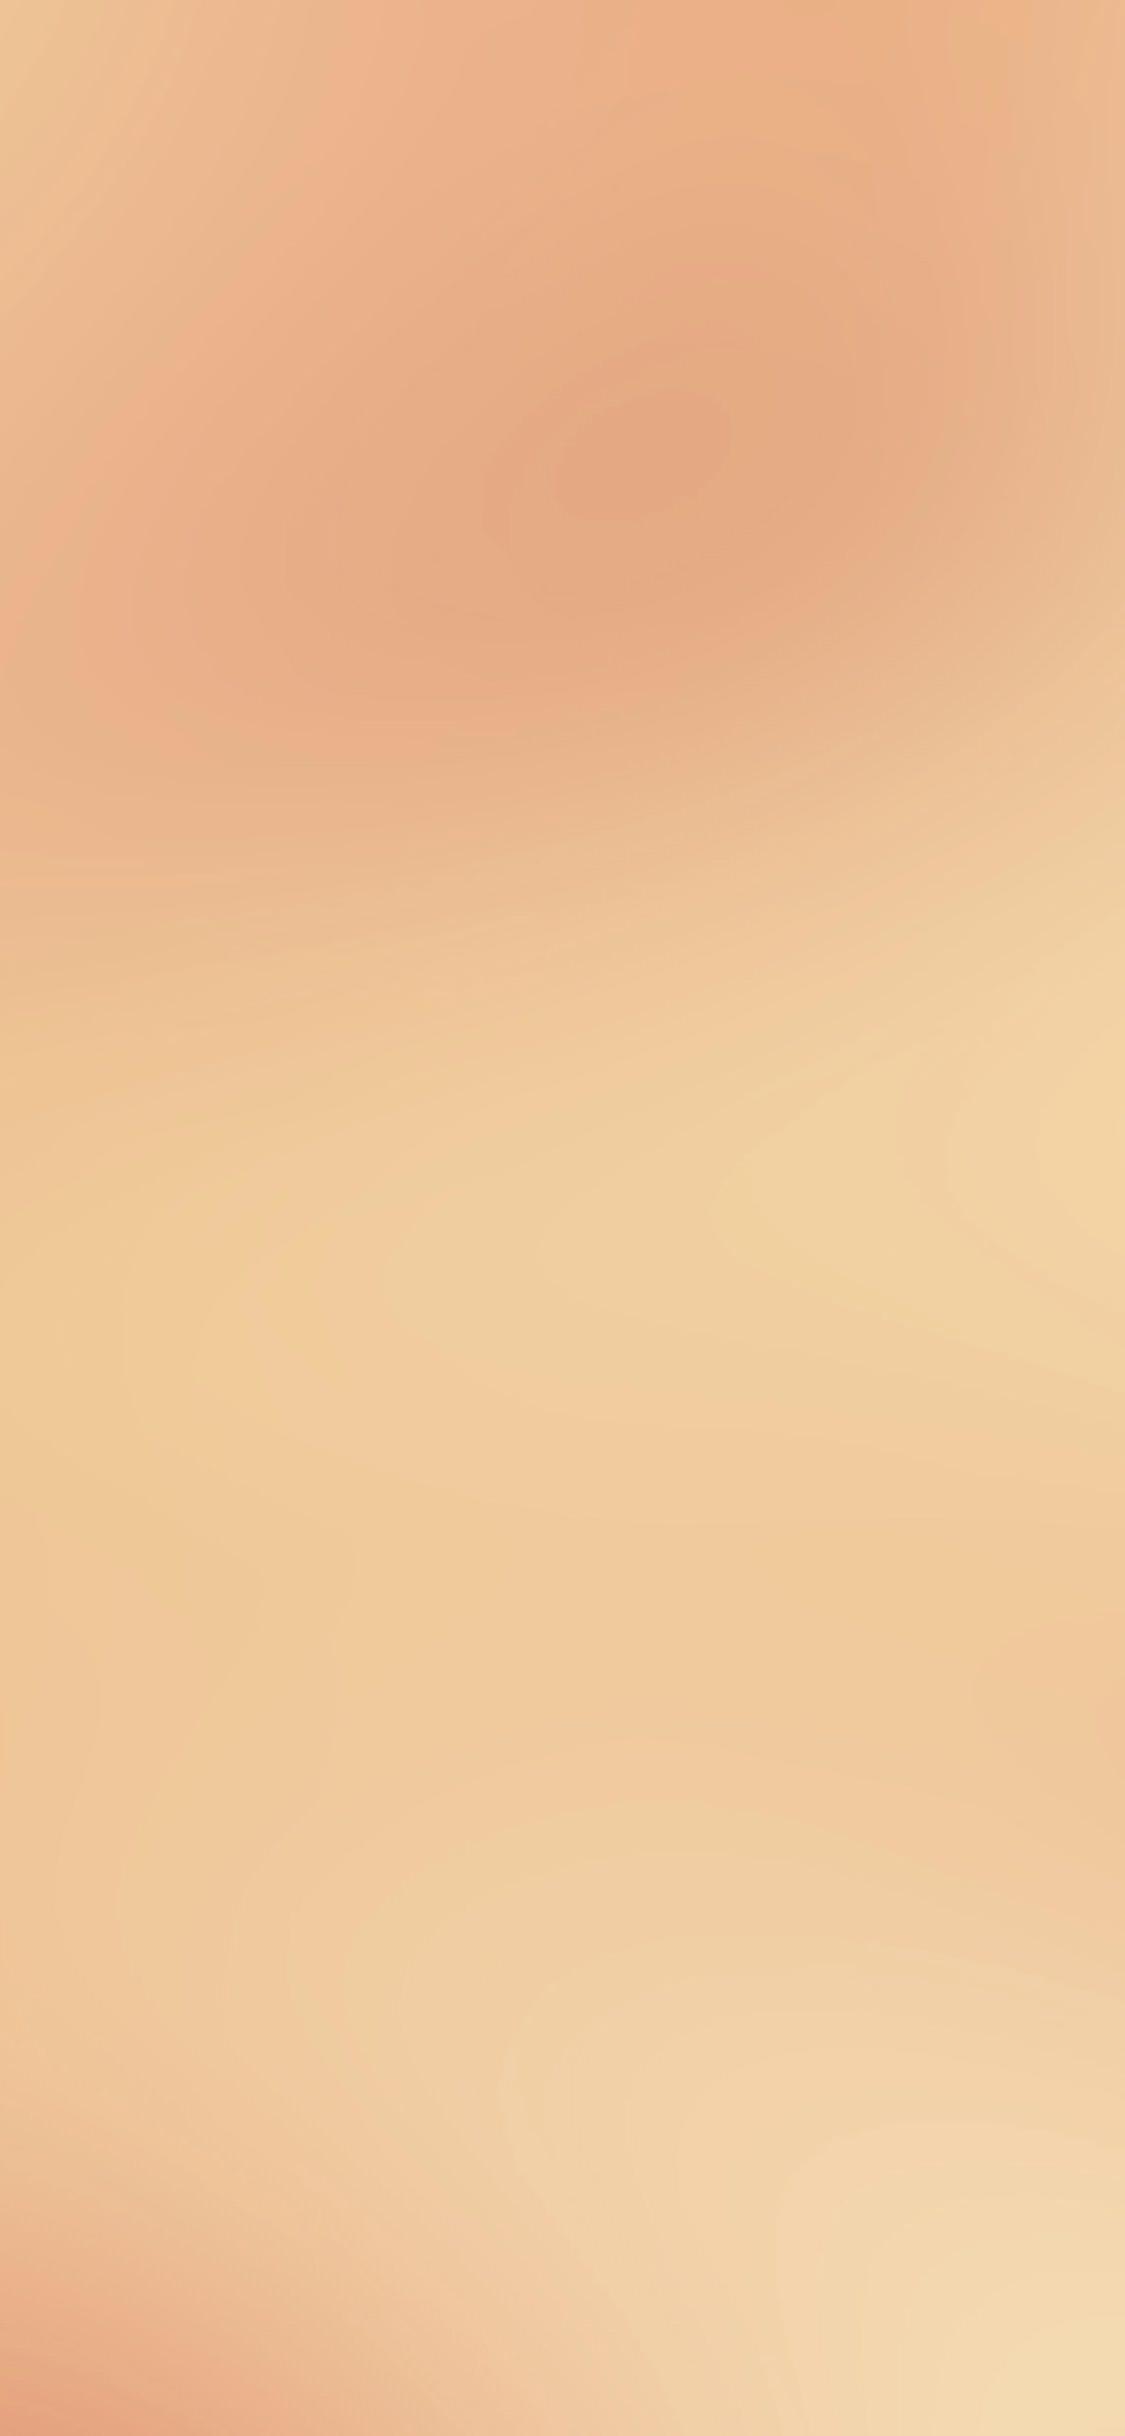 iPhone XS , iPhone X 壁紙 wallpaper 0389